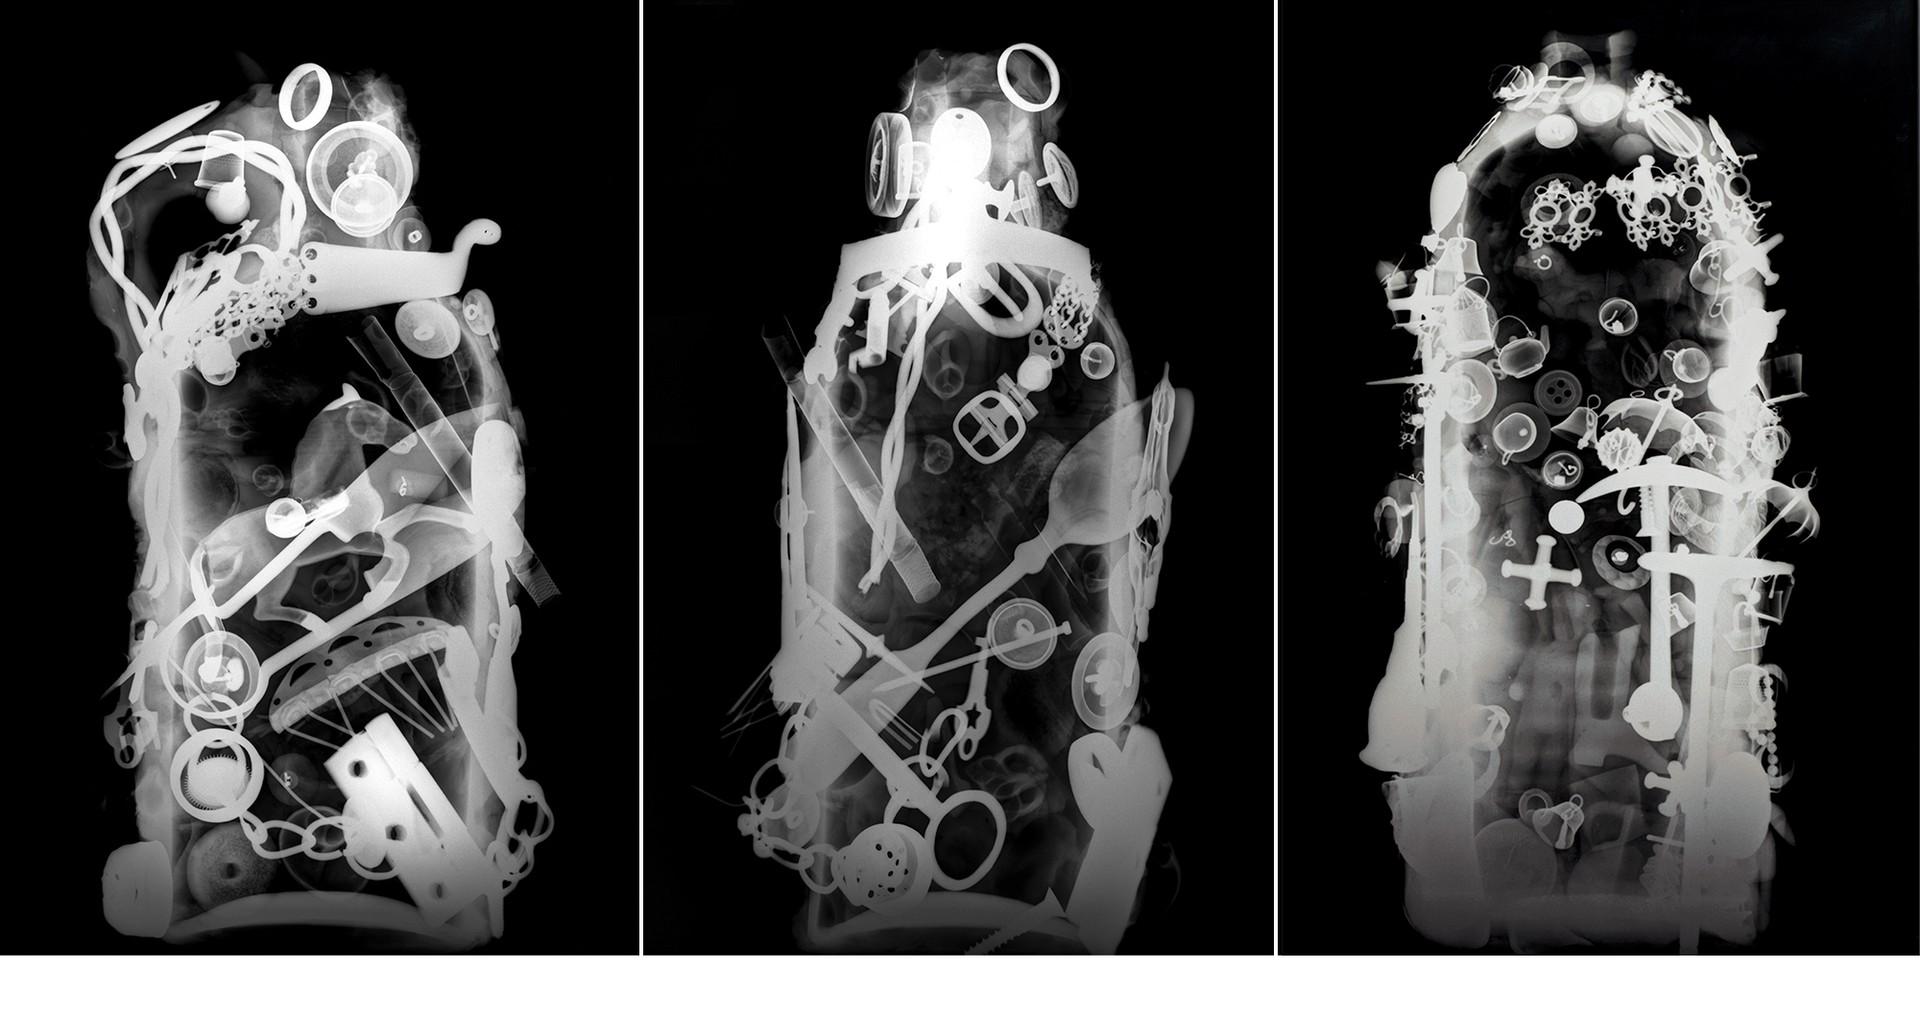 X-rays of three memory jugs